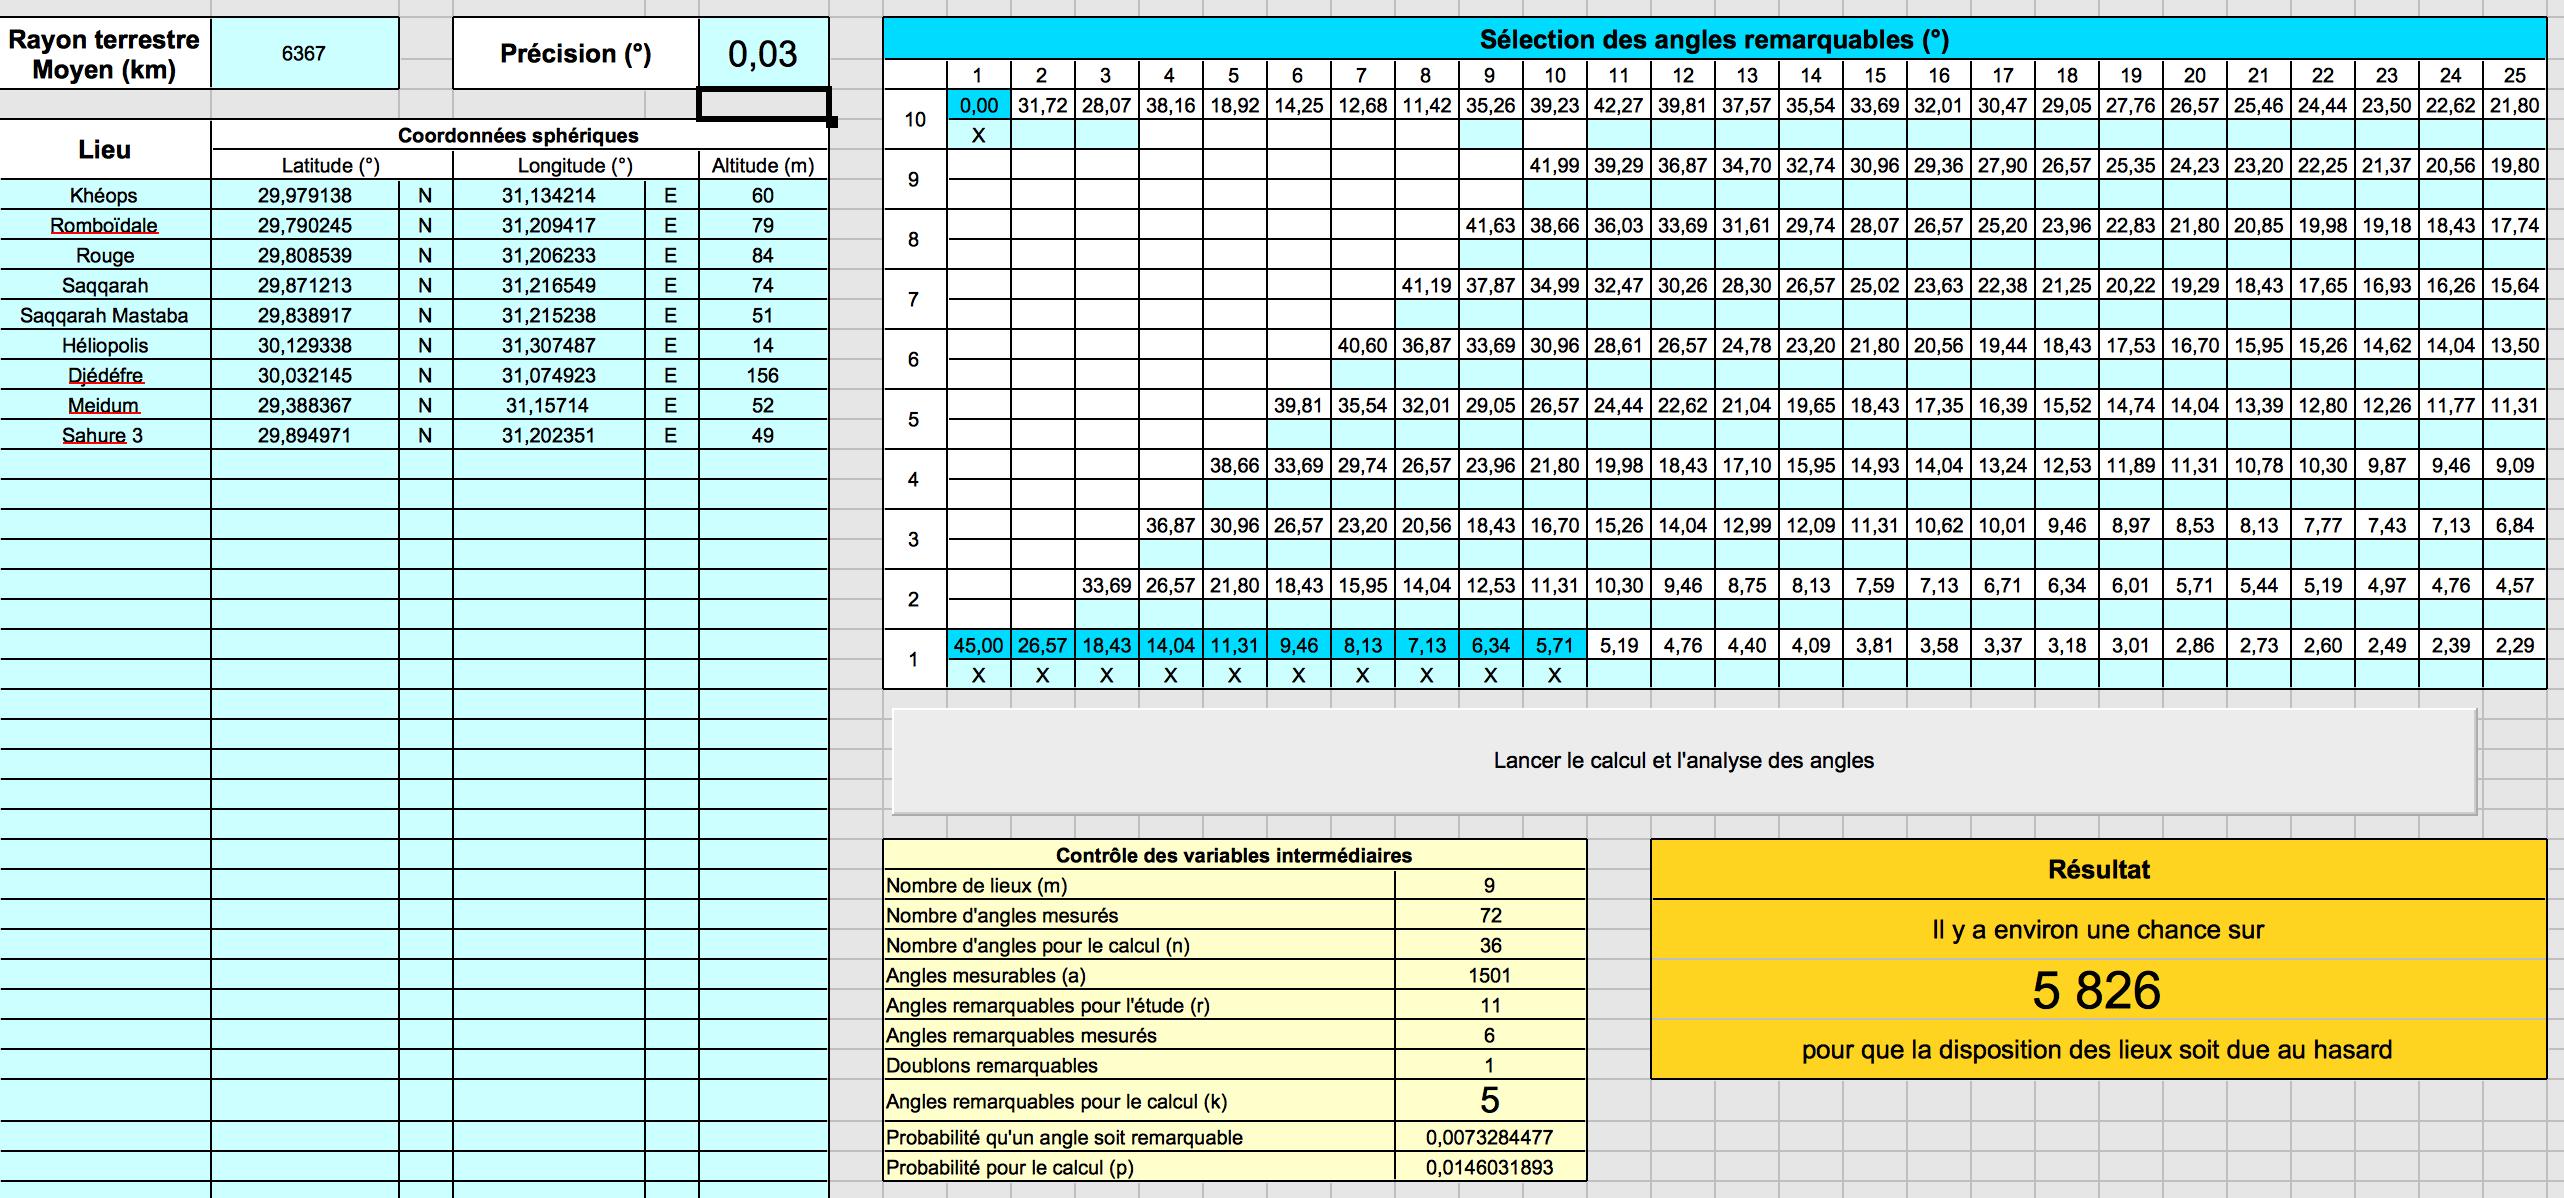 2017-11-16 10:41:26